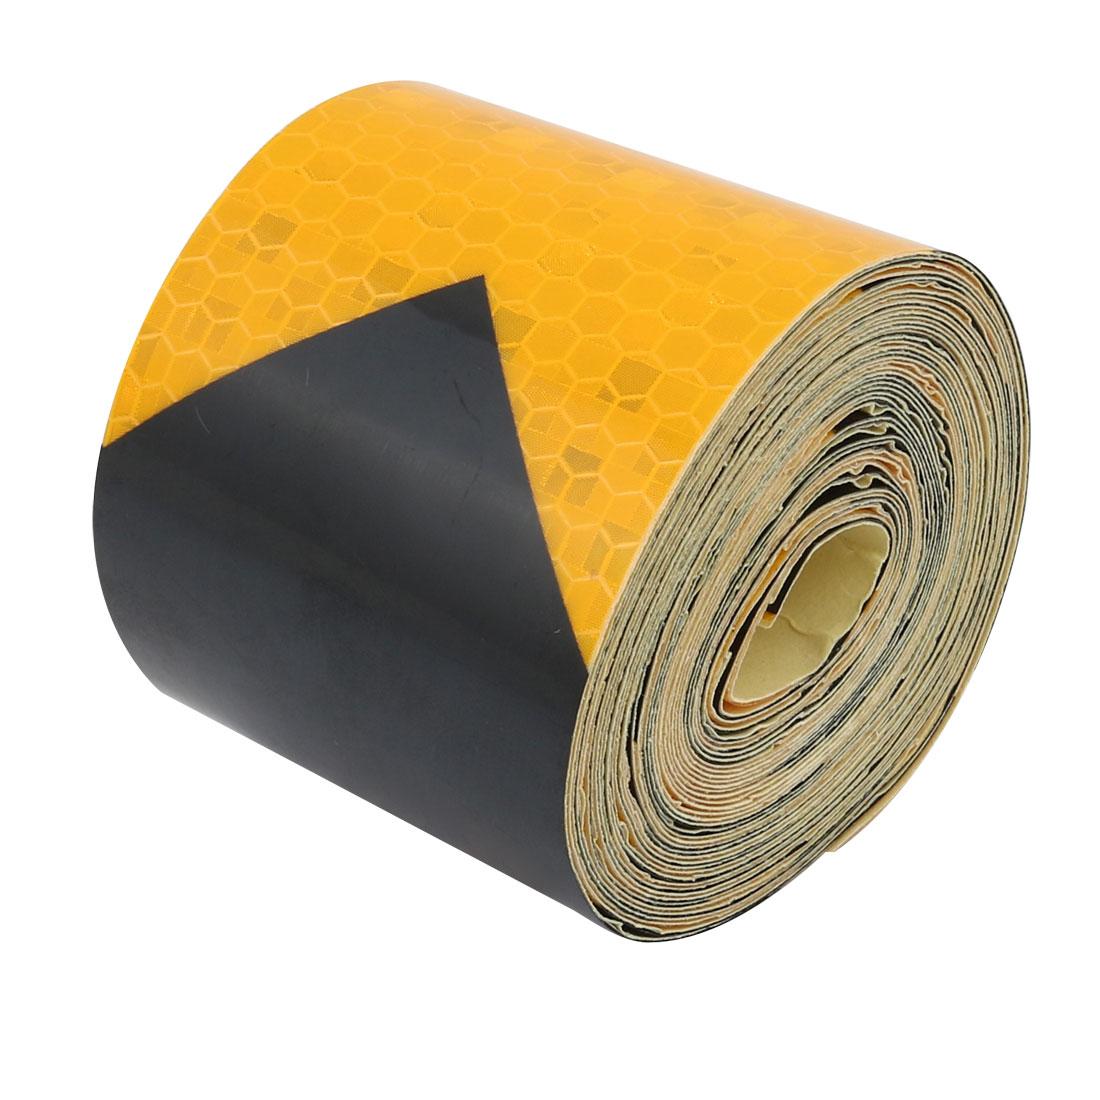 5 Meters Long 5cm Wide Honeycomb Adhesive Reflective Warning Tape Yellow Black